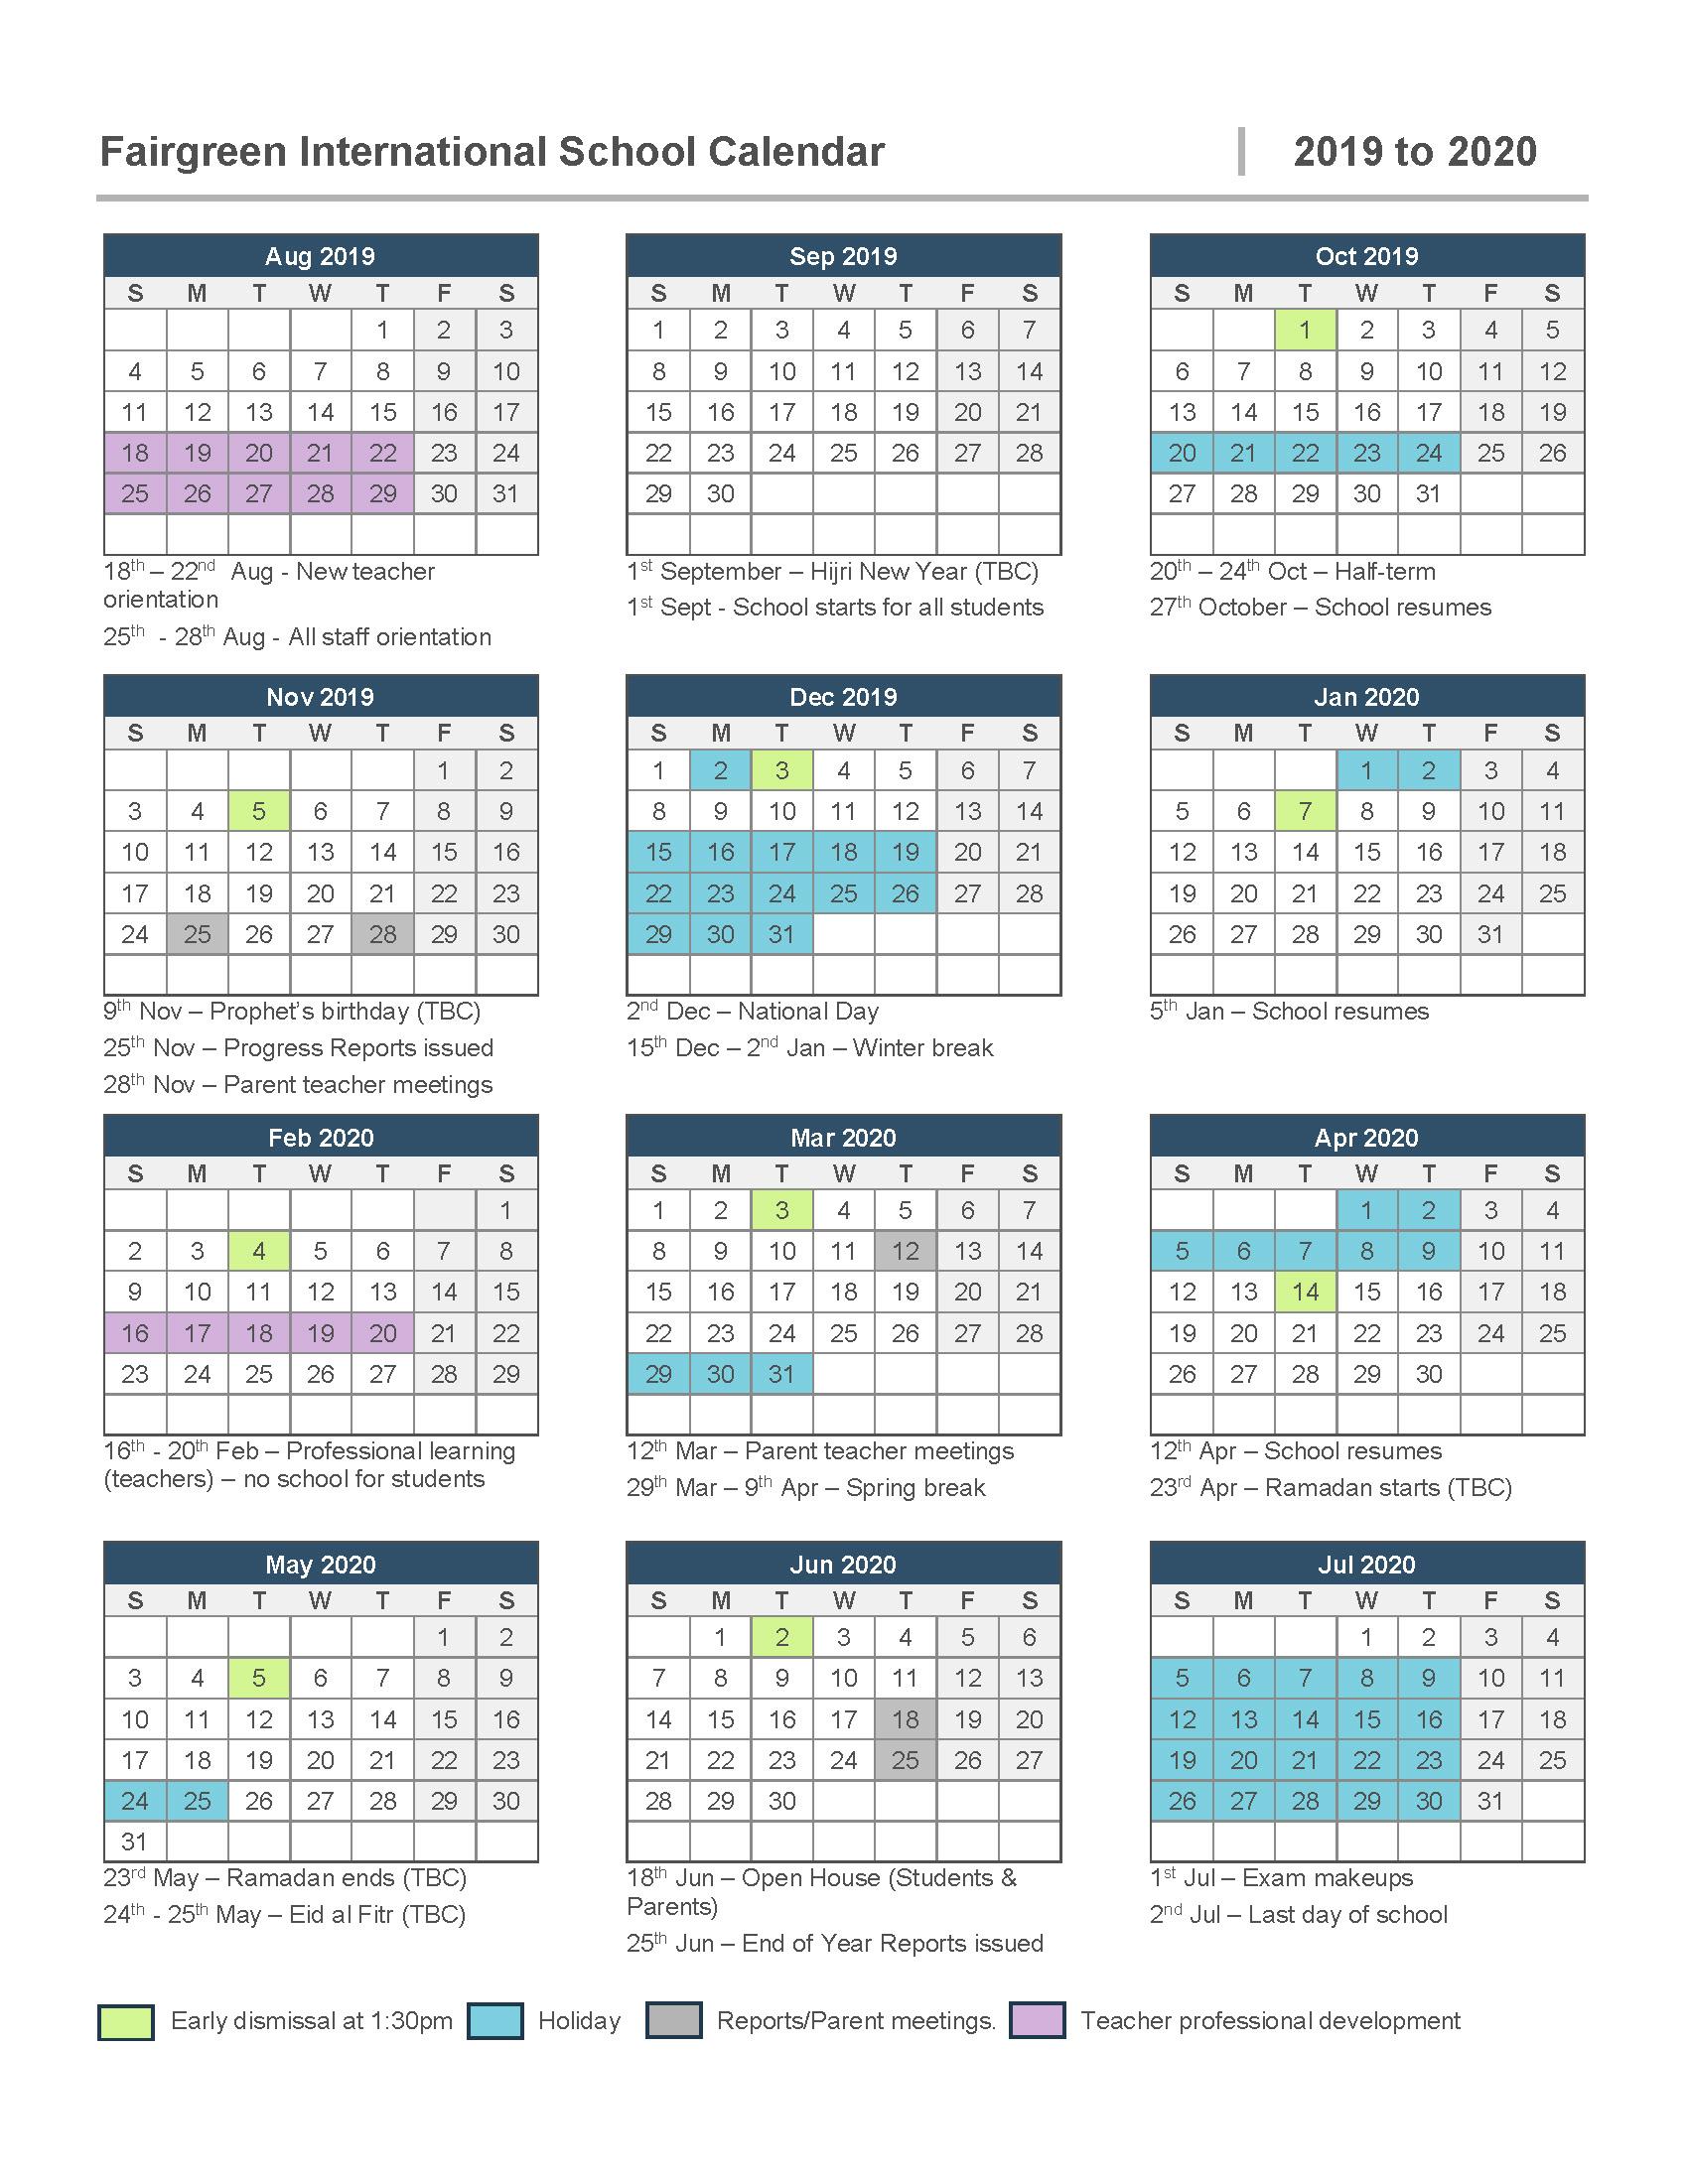 Calendar - Fairgreen International School In Dubai